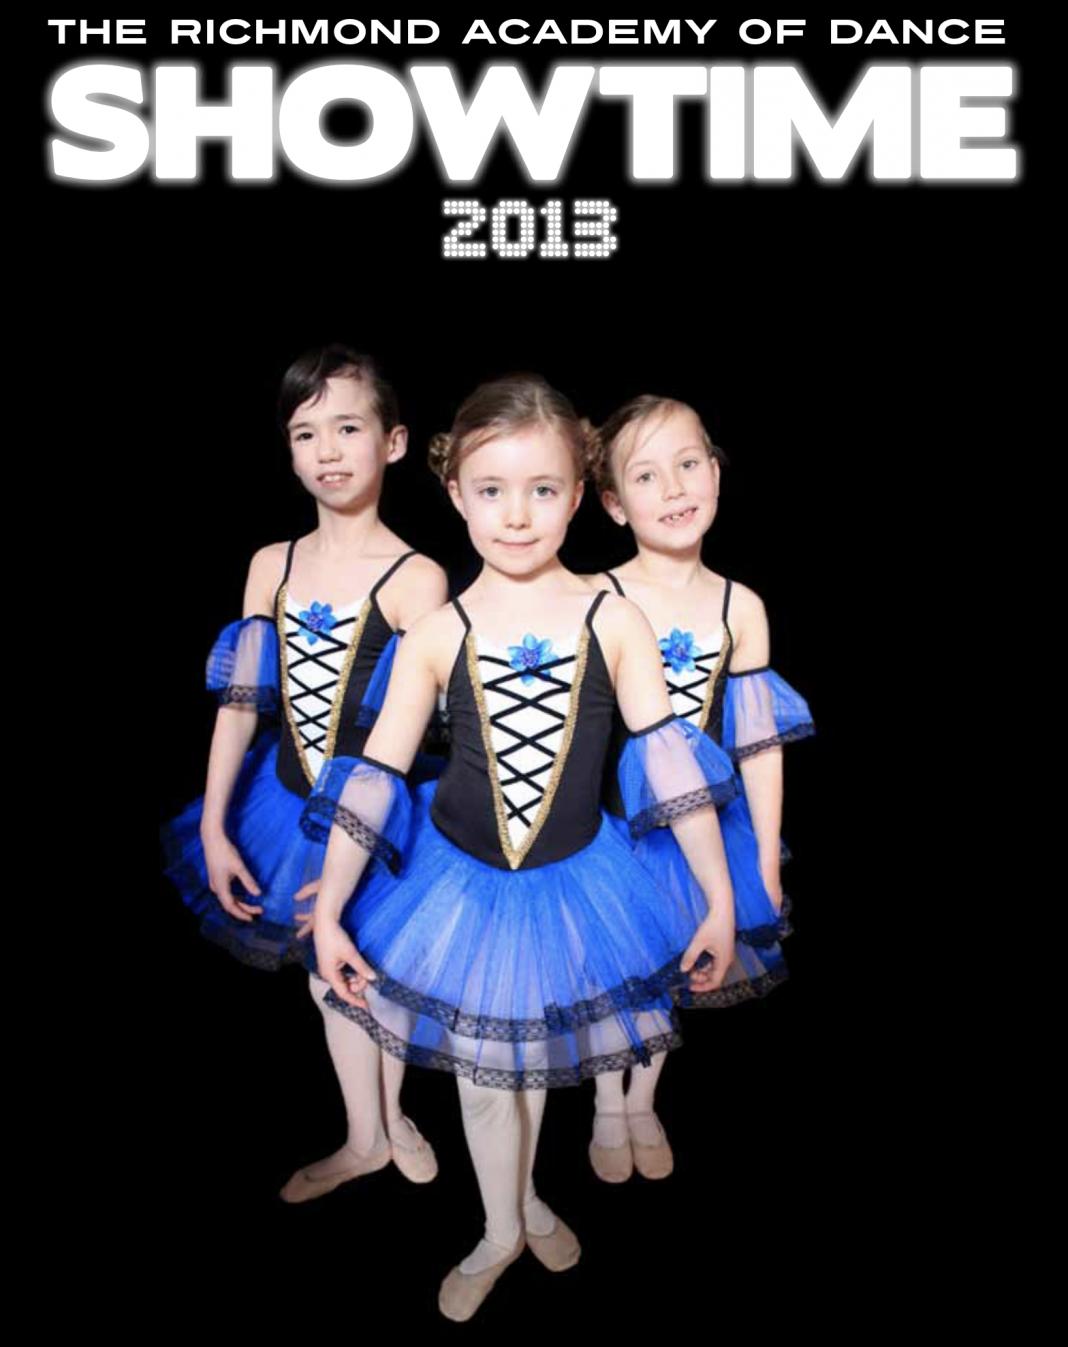 Showtime 2013 dance academy programme